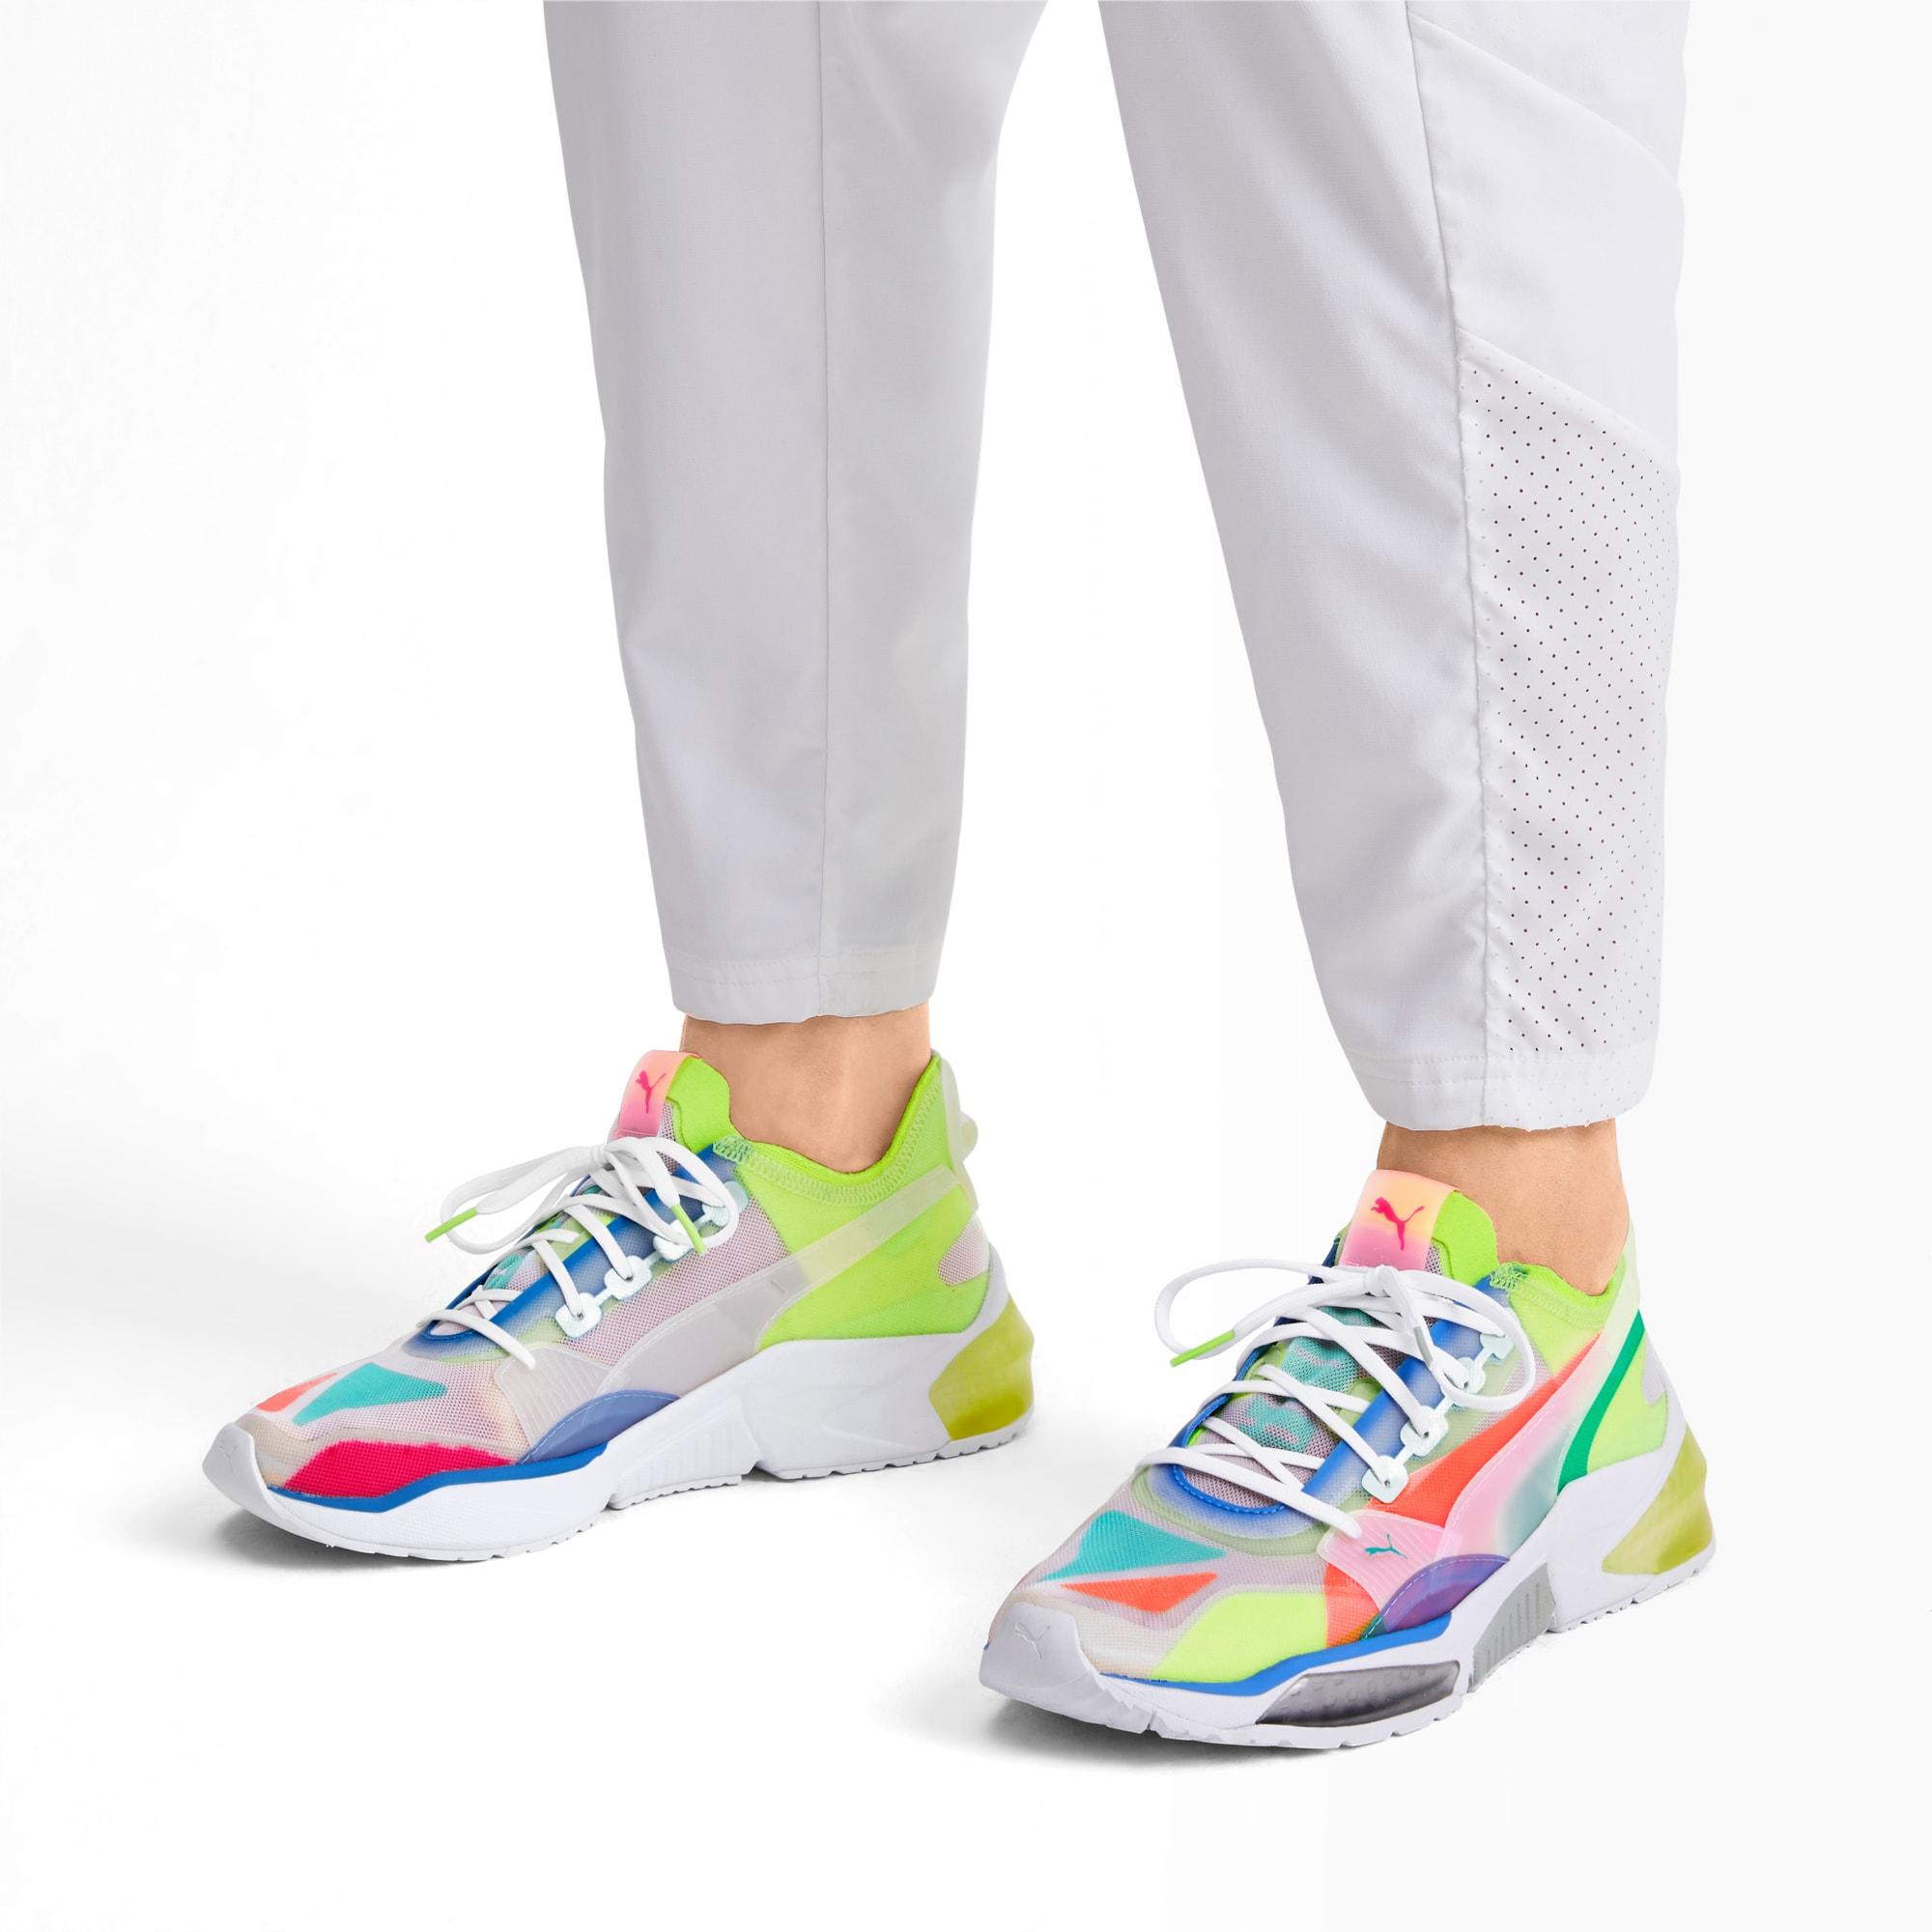 LQDCELL Optic Sheer Men's Training Shoes